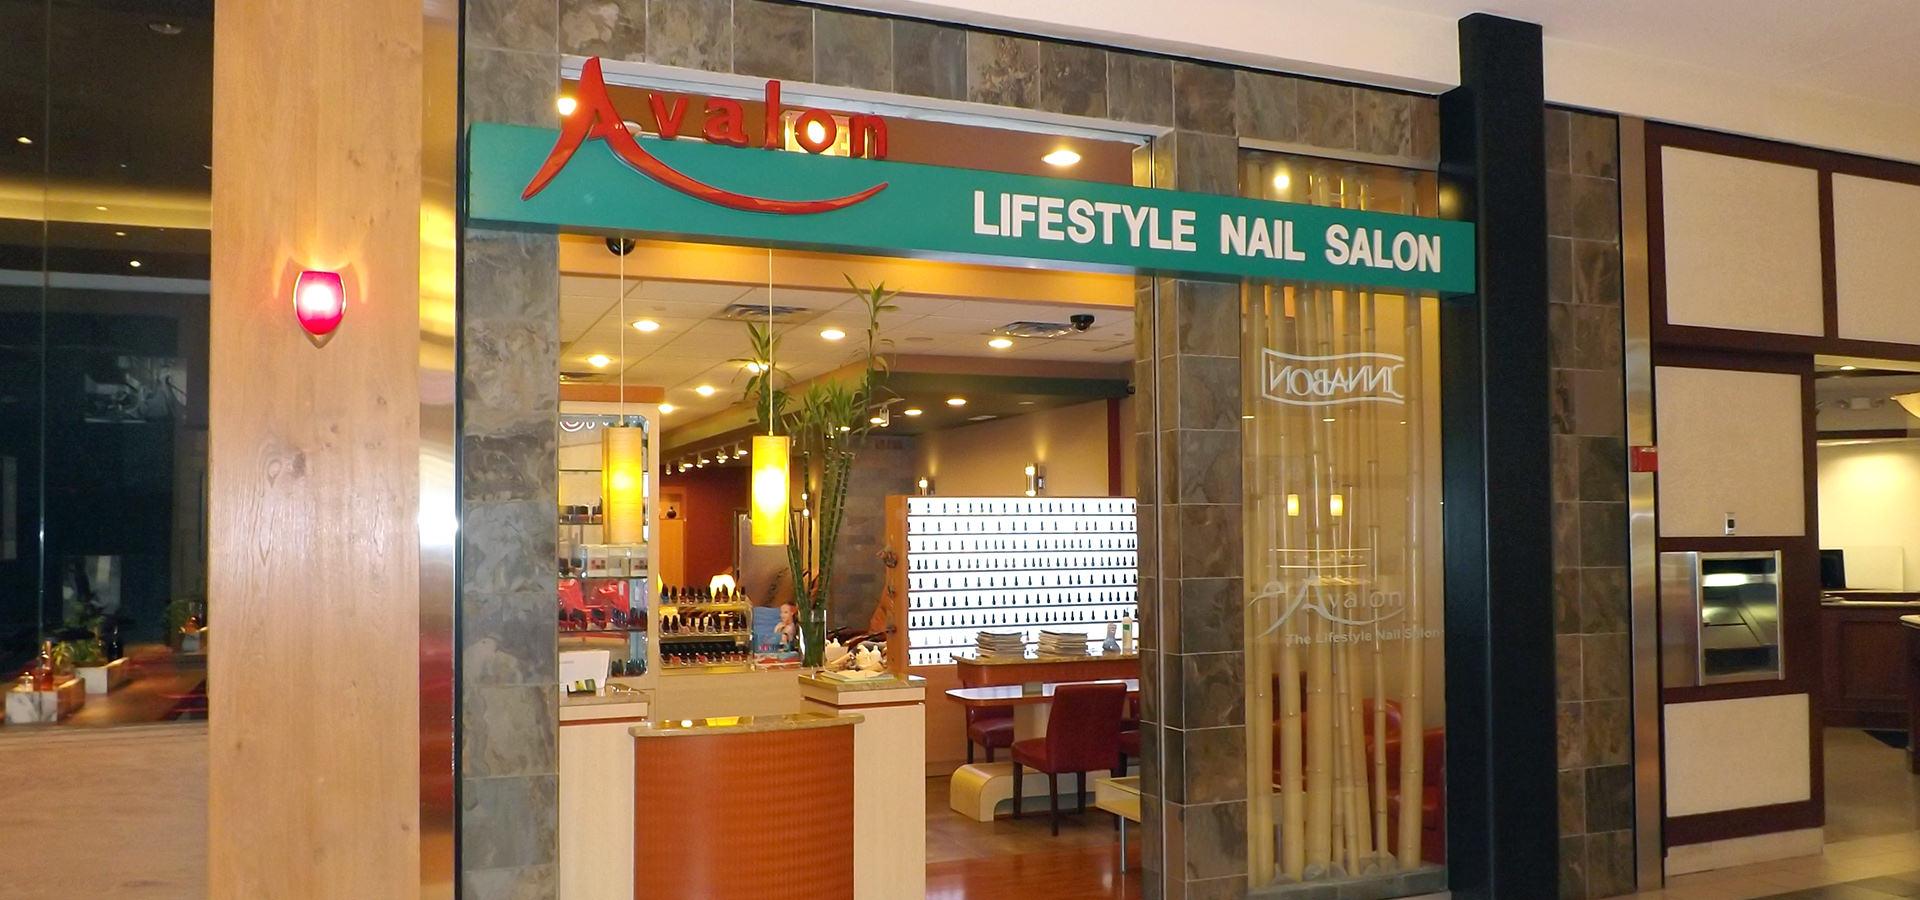 Avalon lifestyle nail salon spa near me in dulles va dulles town center for Nail salon winter garden village